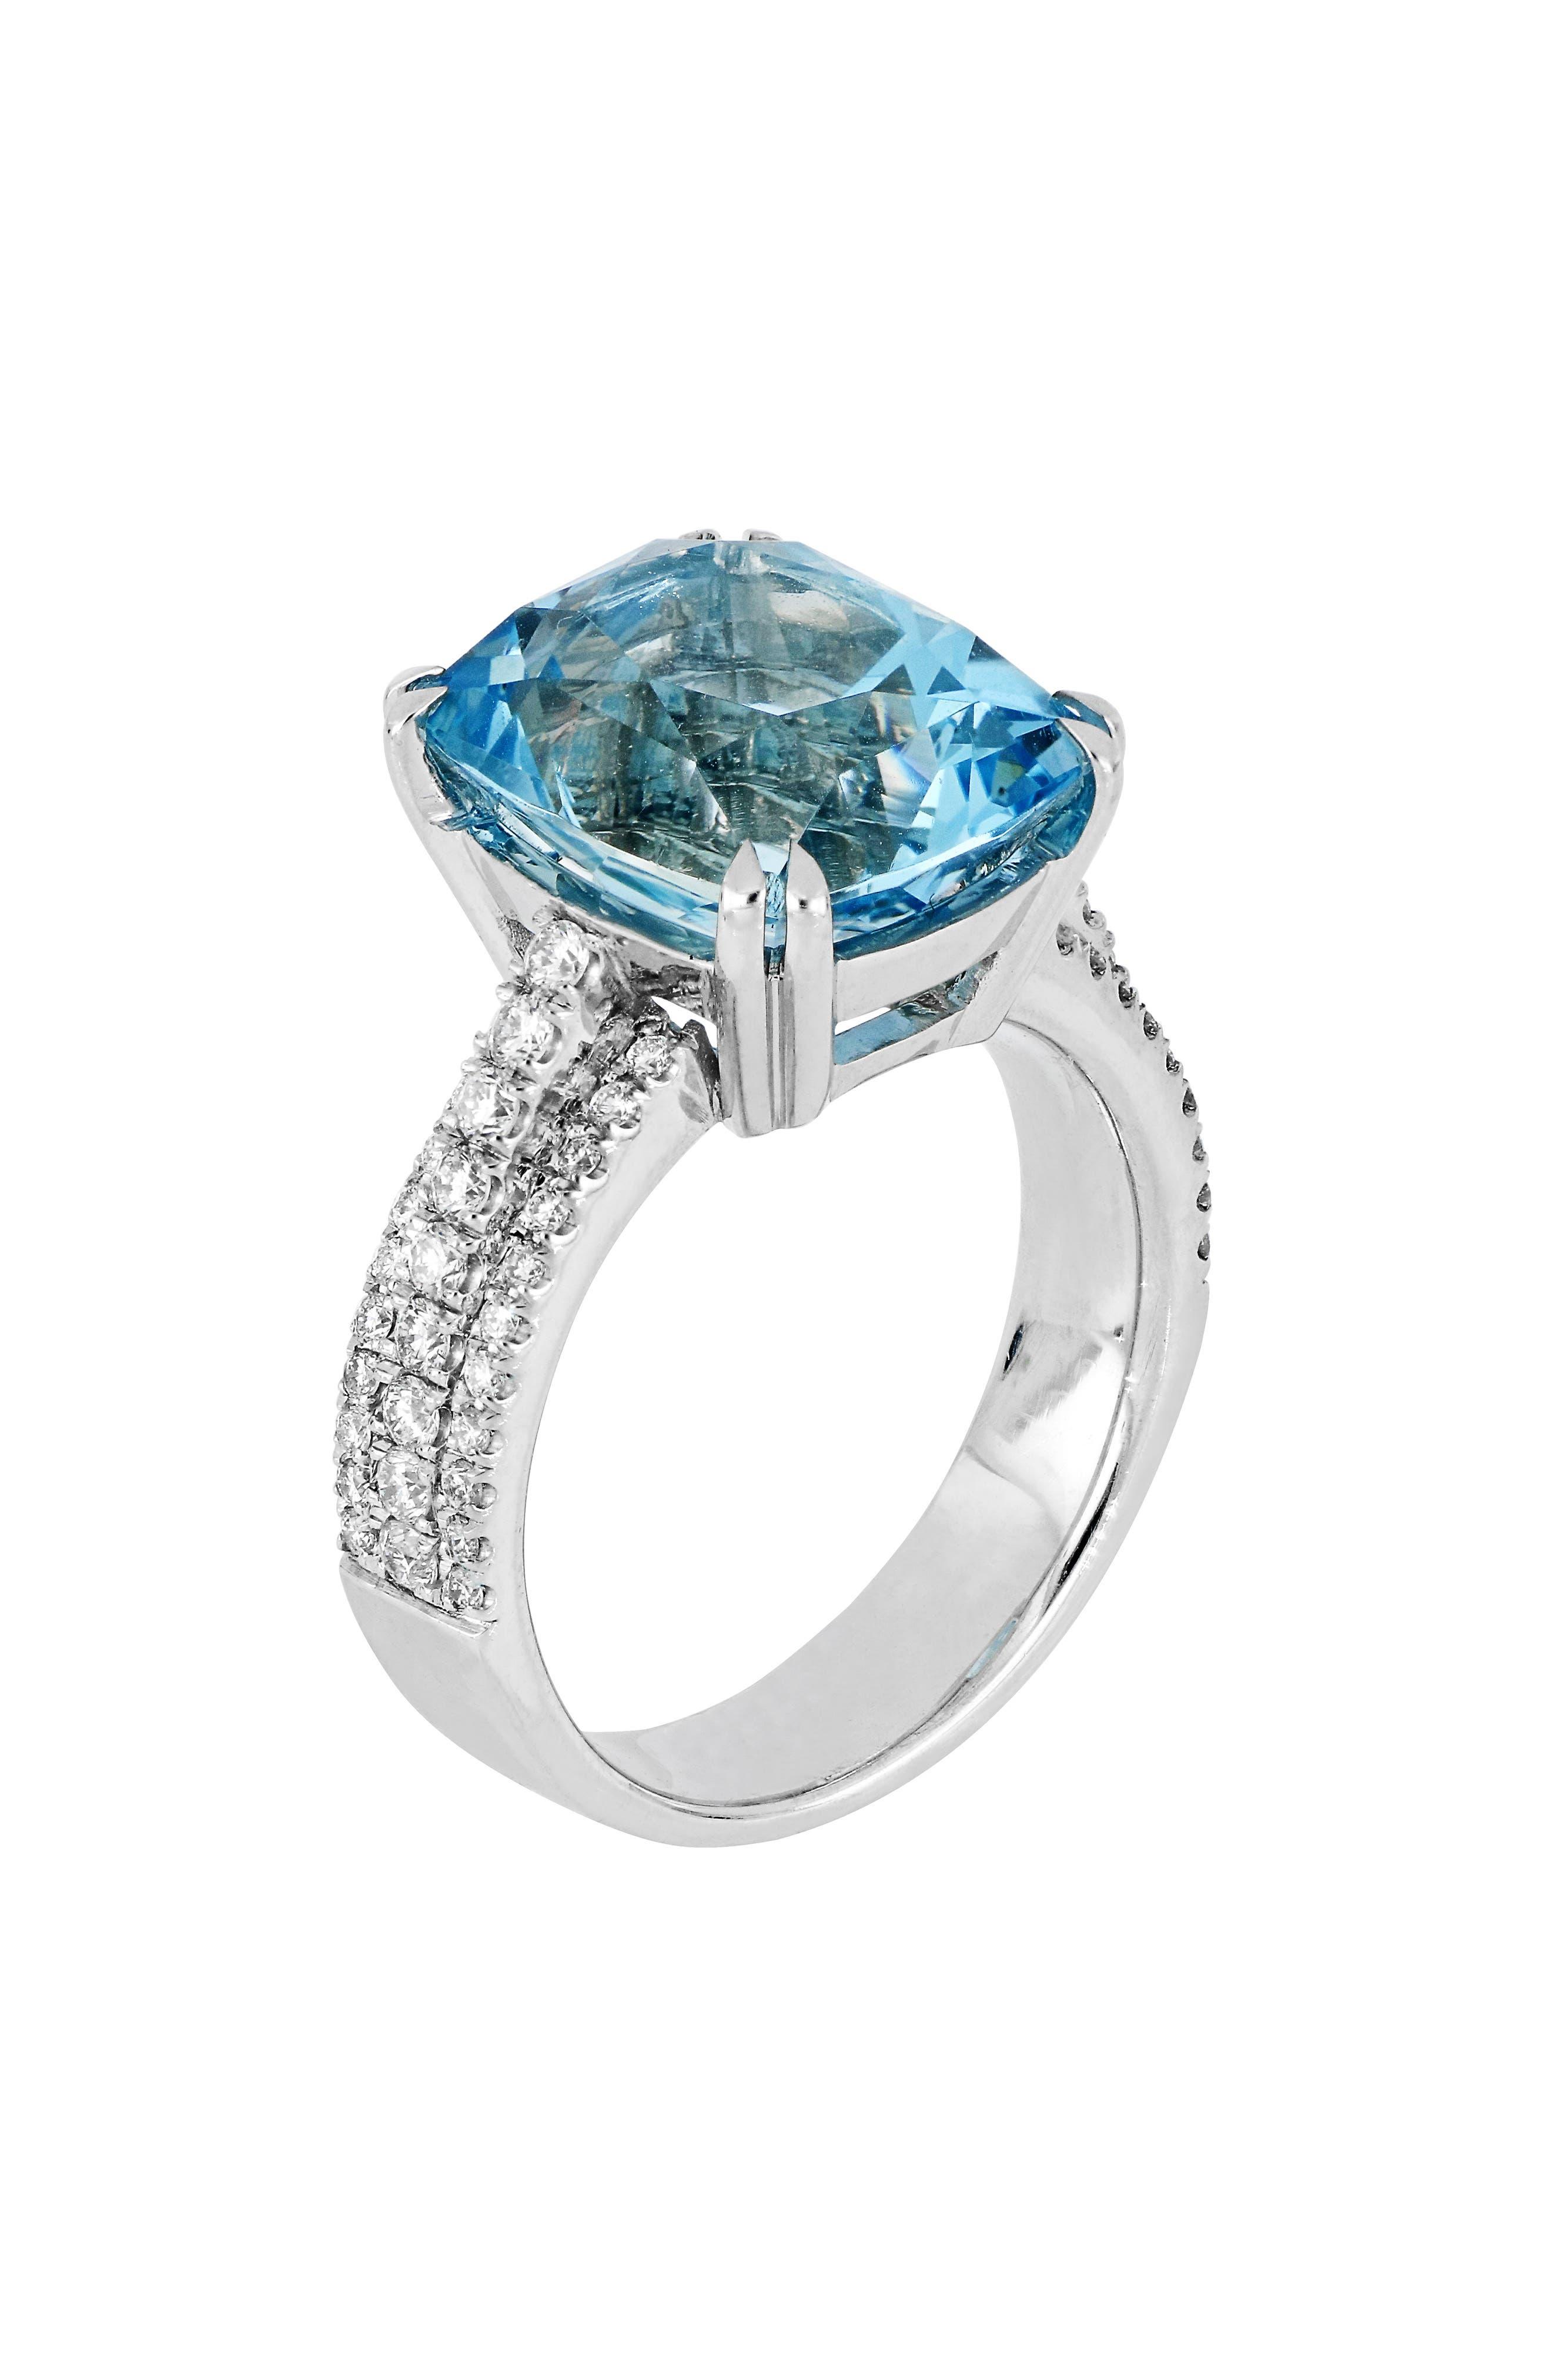 Aquamarine & Diamond Ring,                             Main thumbnail 1, color,                             WHITE GOLD